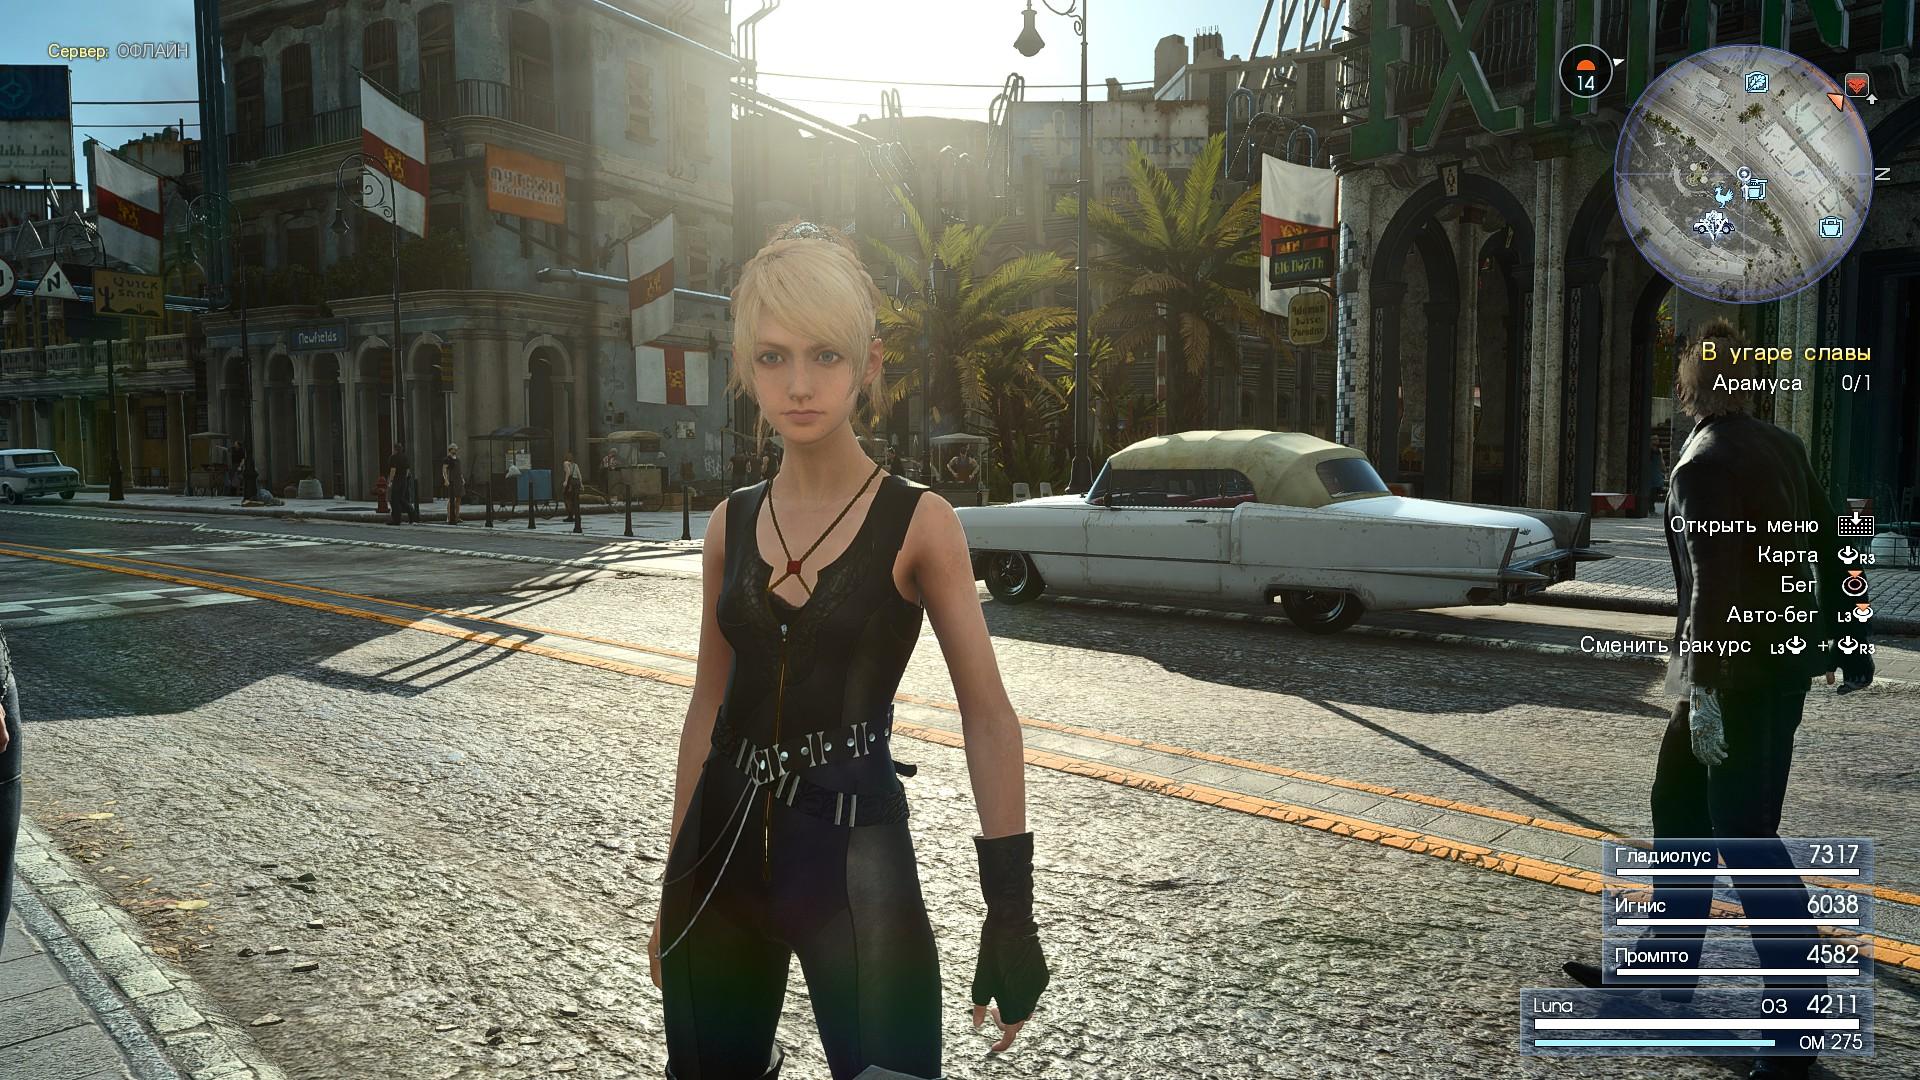 637650_screenshots_20190721185625_1.jpg - Final Fantasy 15